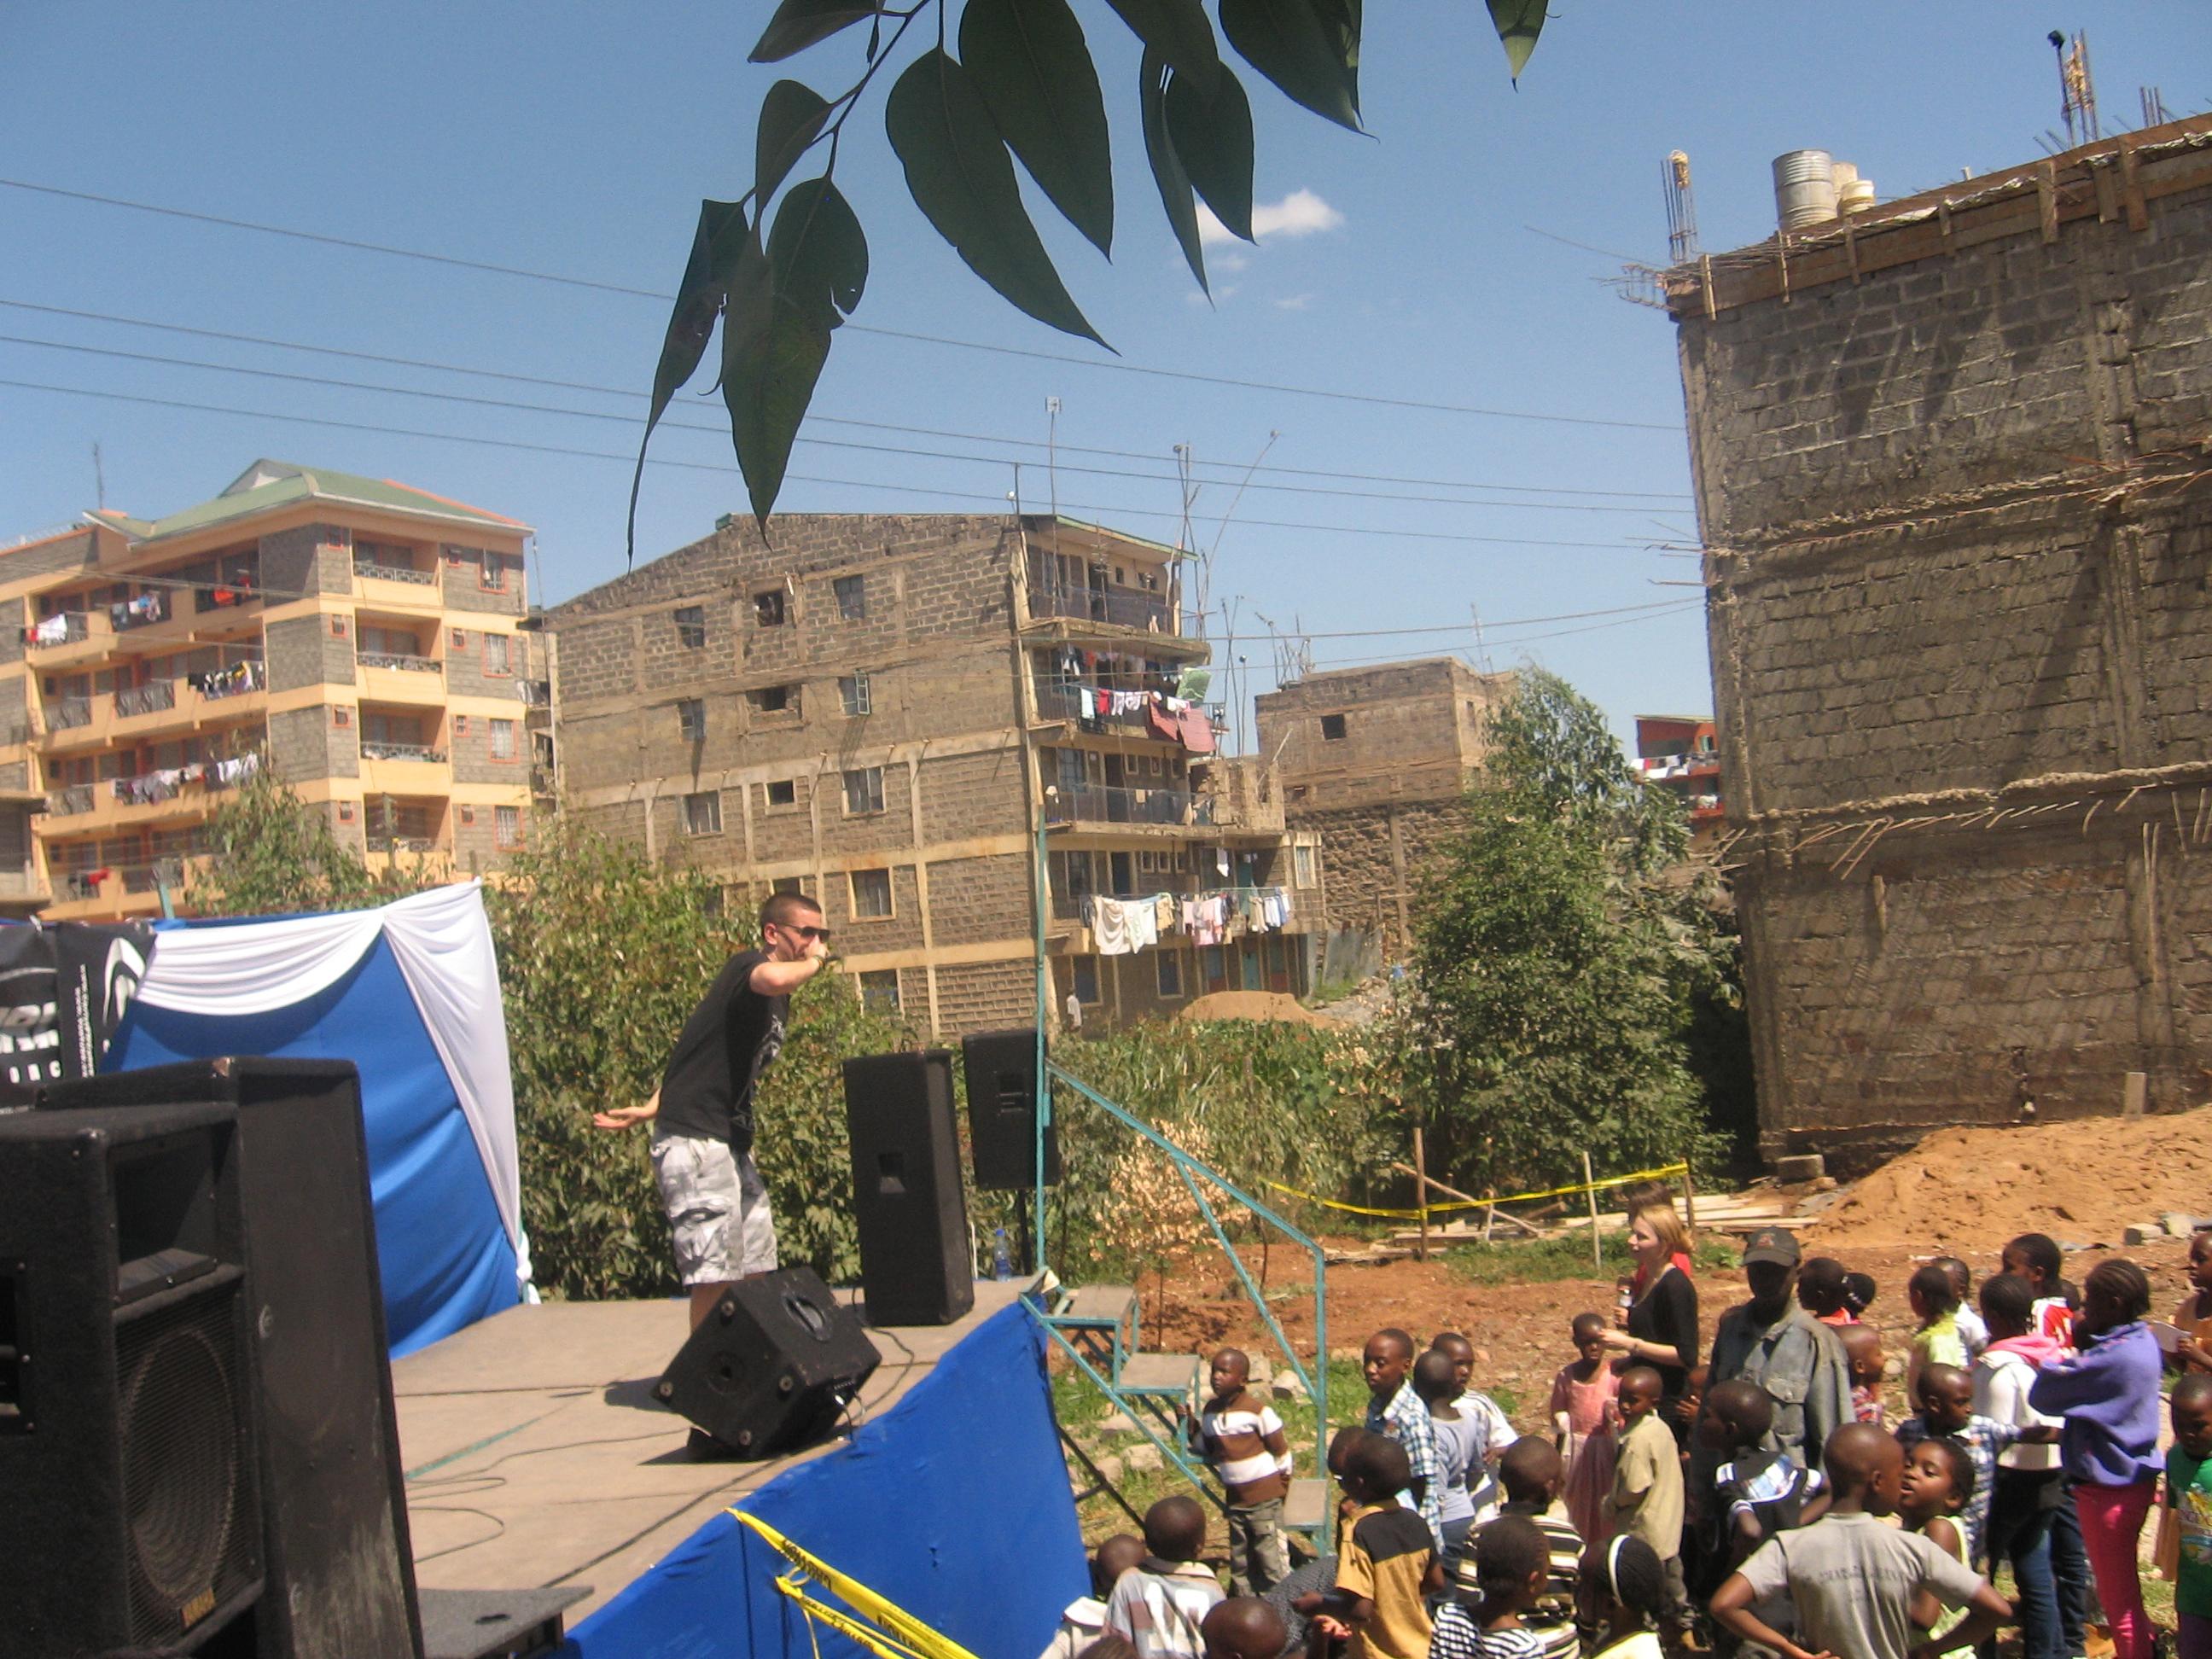 Githurai, Nairobi